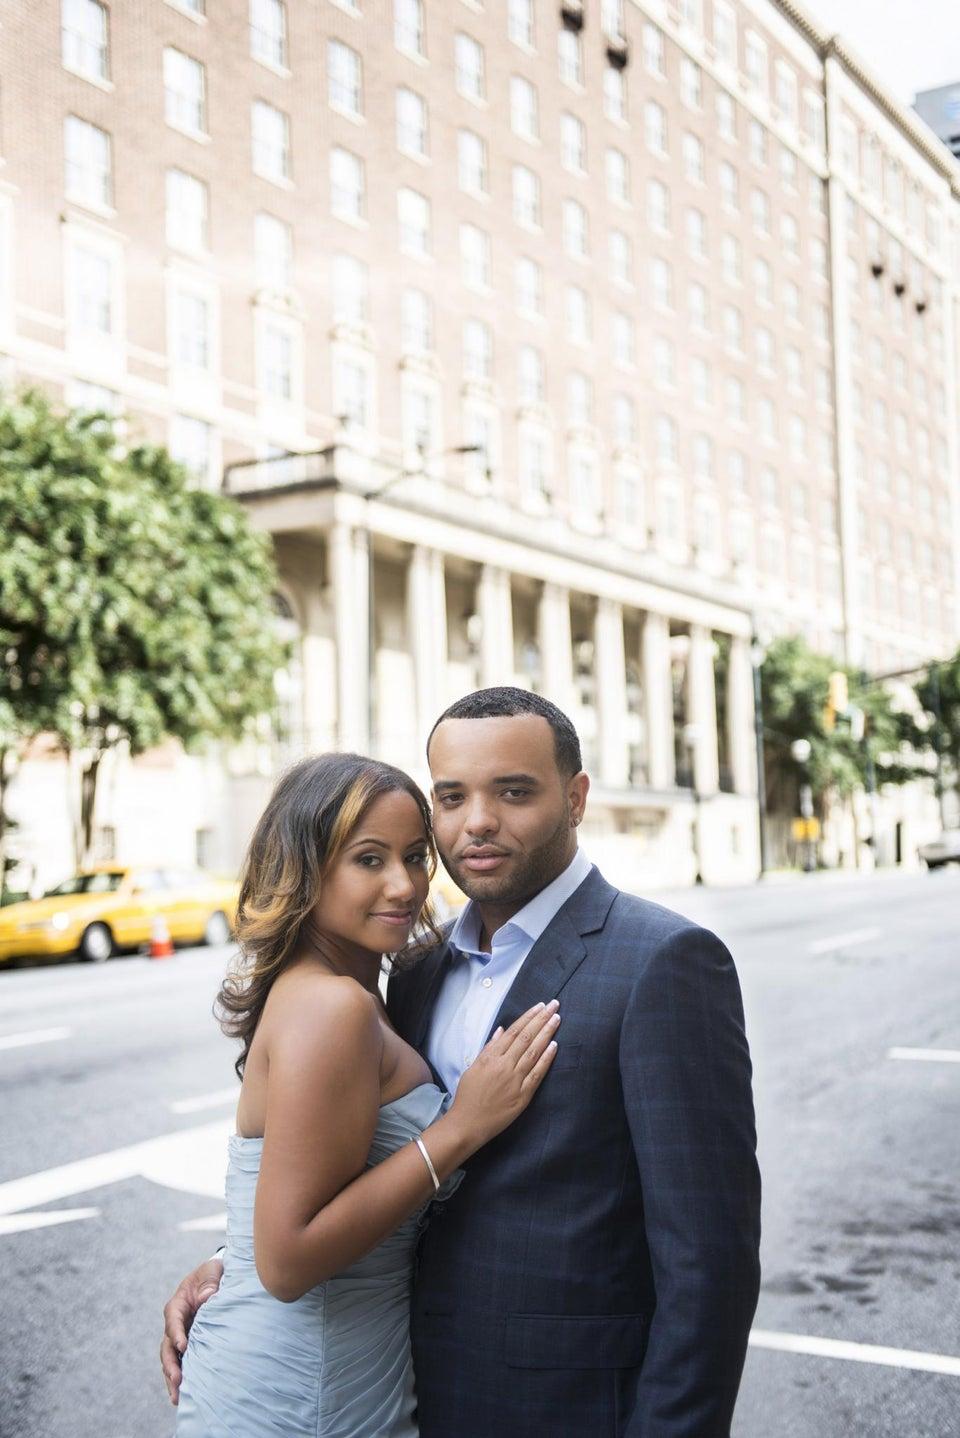 Just Engaged: Jenaya and Brian's Love Story